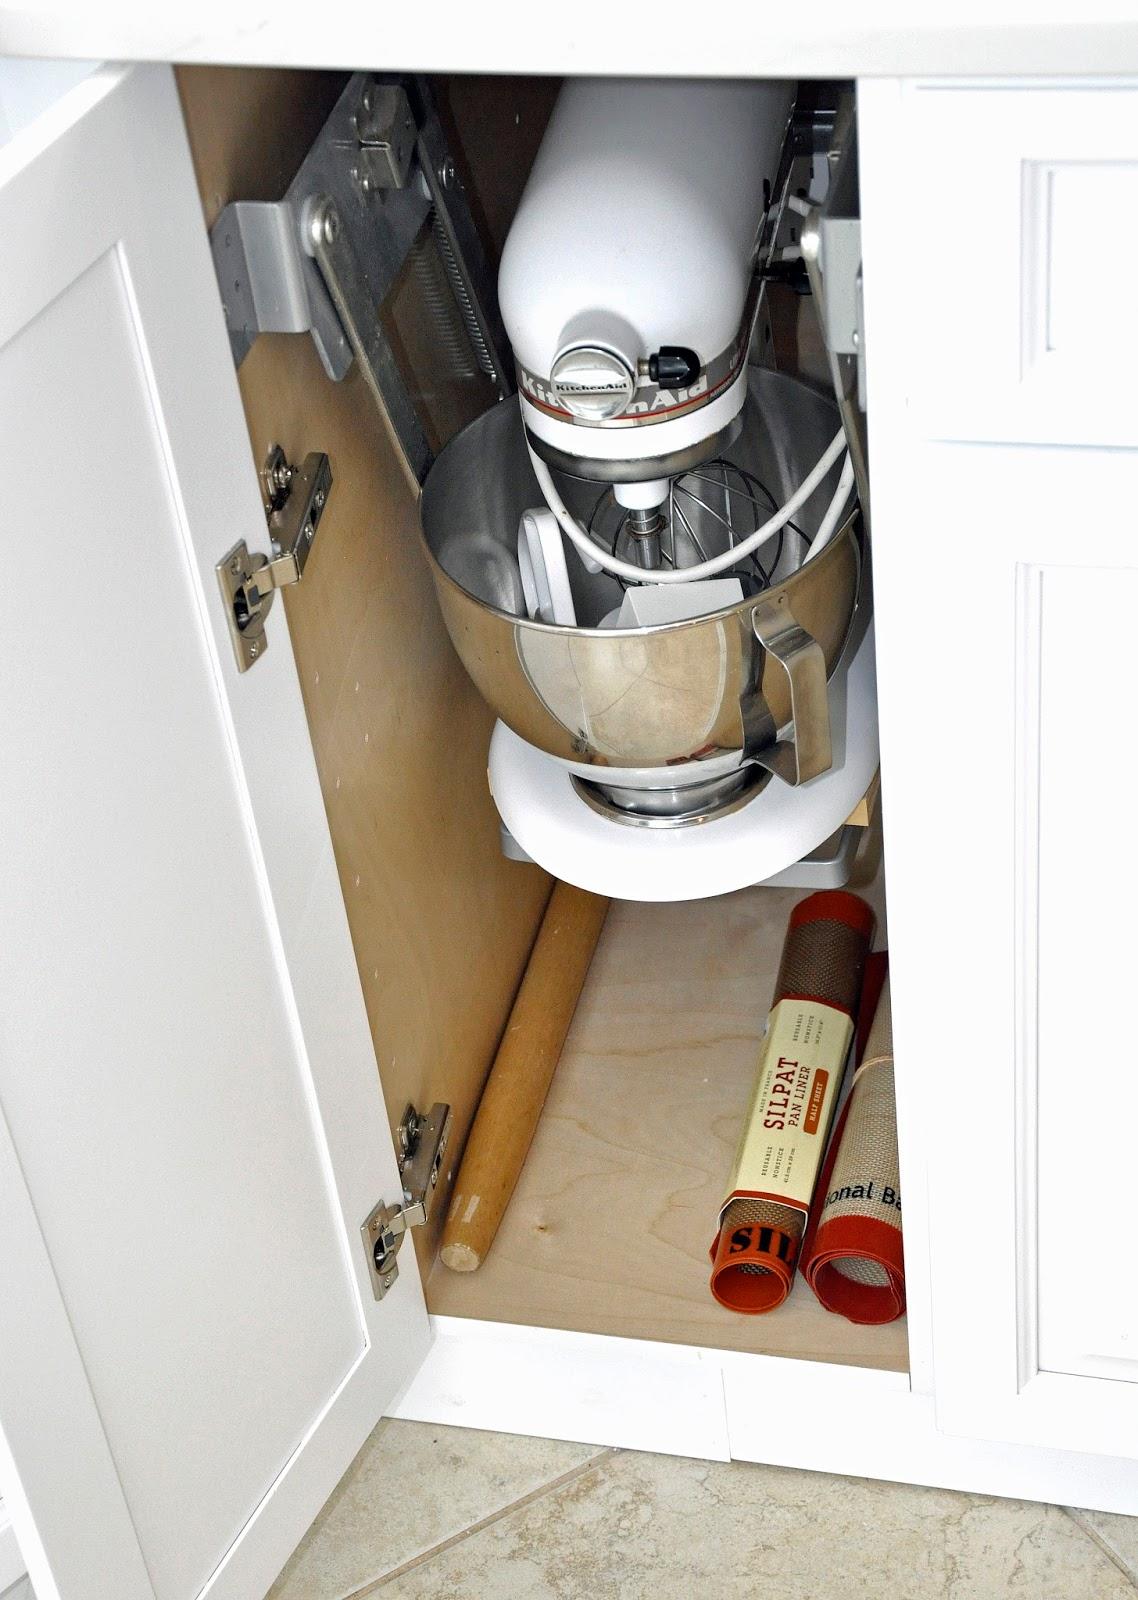 Best Kitchen Gallery: My Carolina Kitchen Remodeled Kitchen And Butler's Pantry Reveal of Kitchenaid Stand Mixer Storage Cabinet on rachelxblog.com